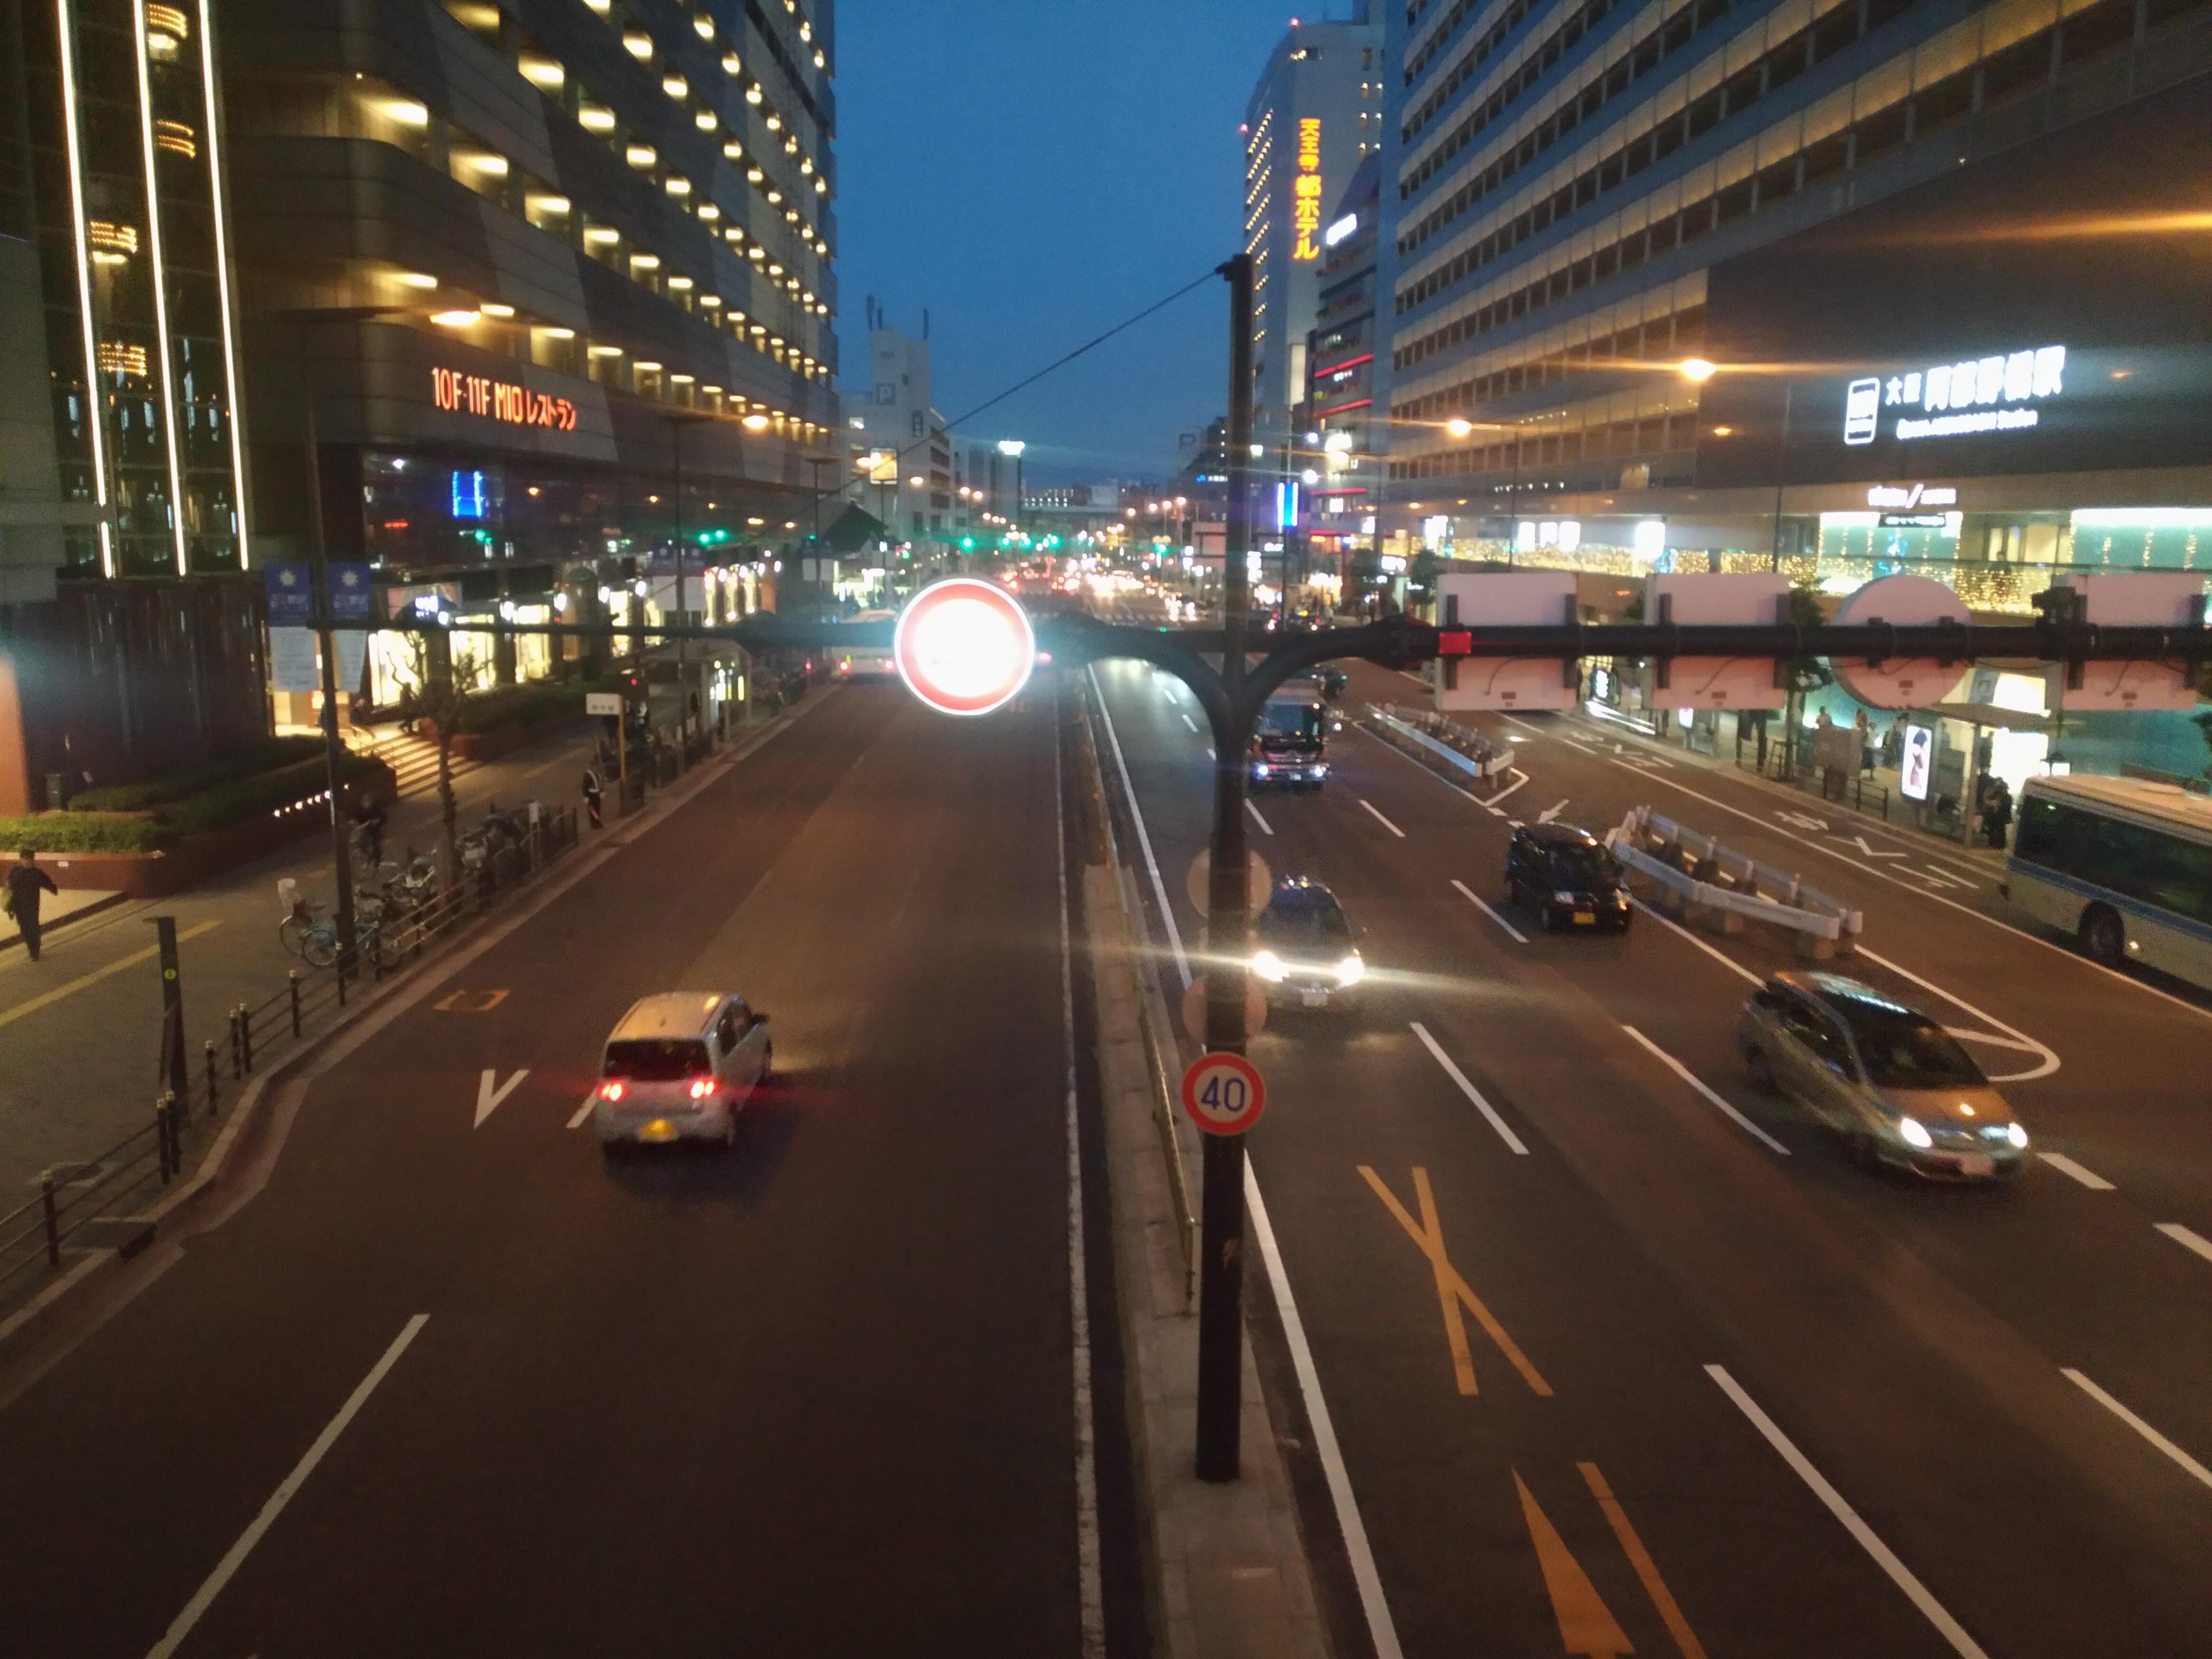 Zenfone3で動物と夜景を撮ってみた。標準カメラアプリはクラッシュする?